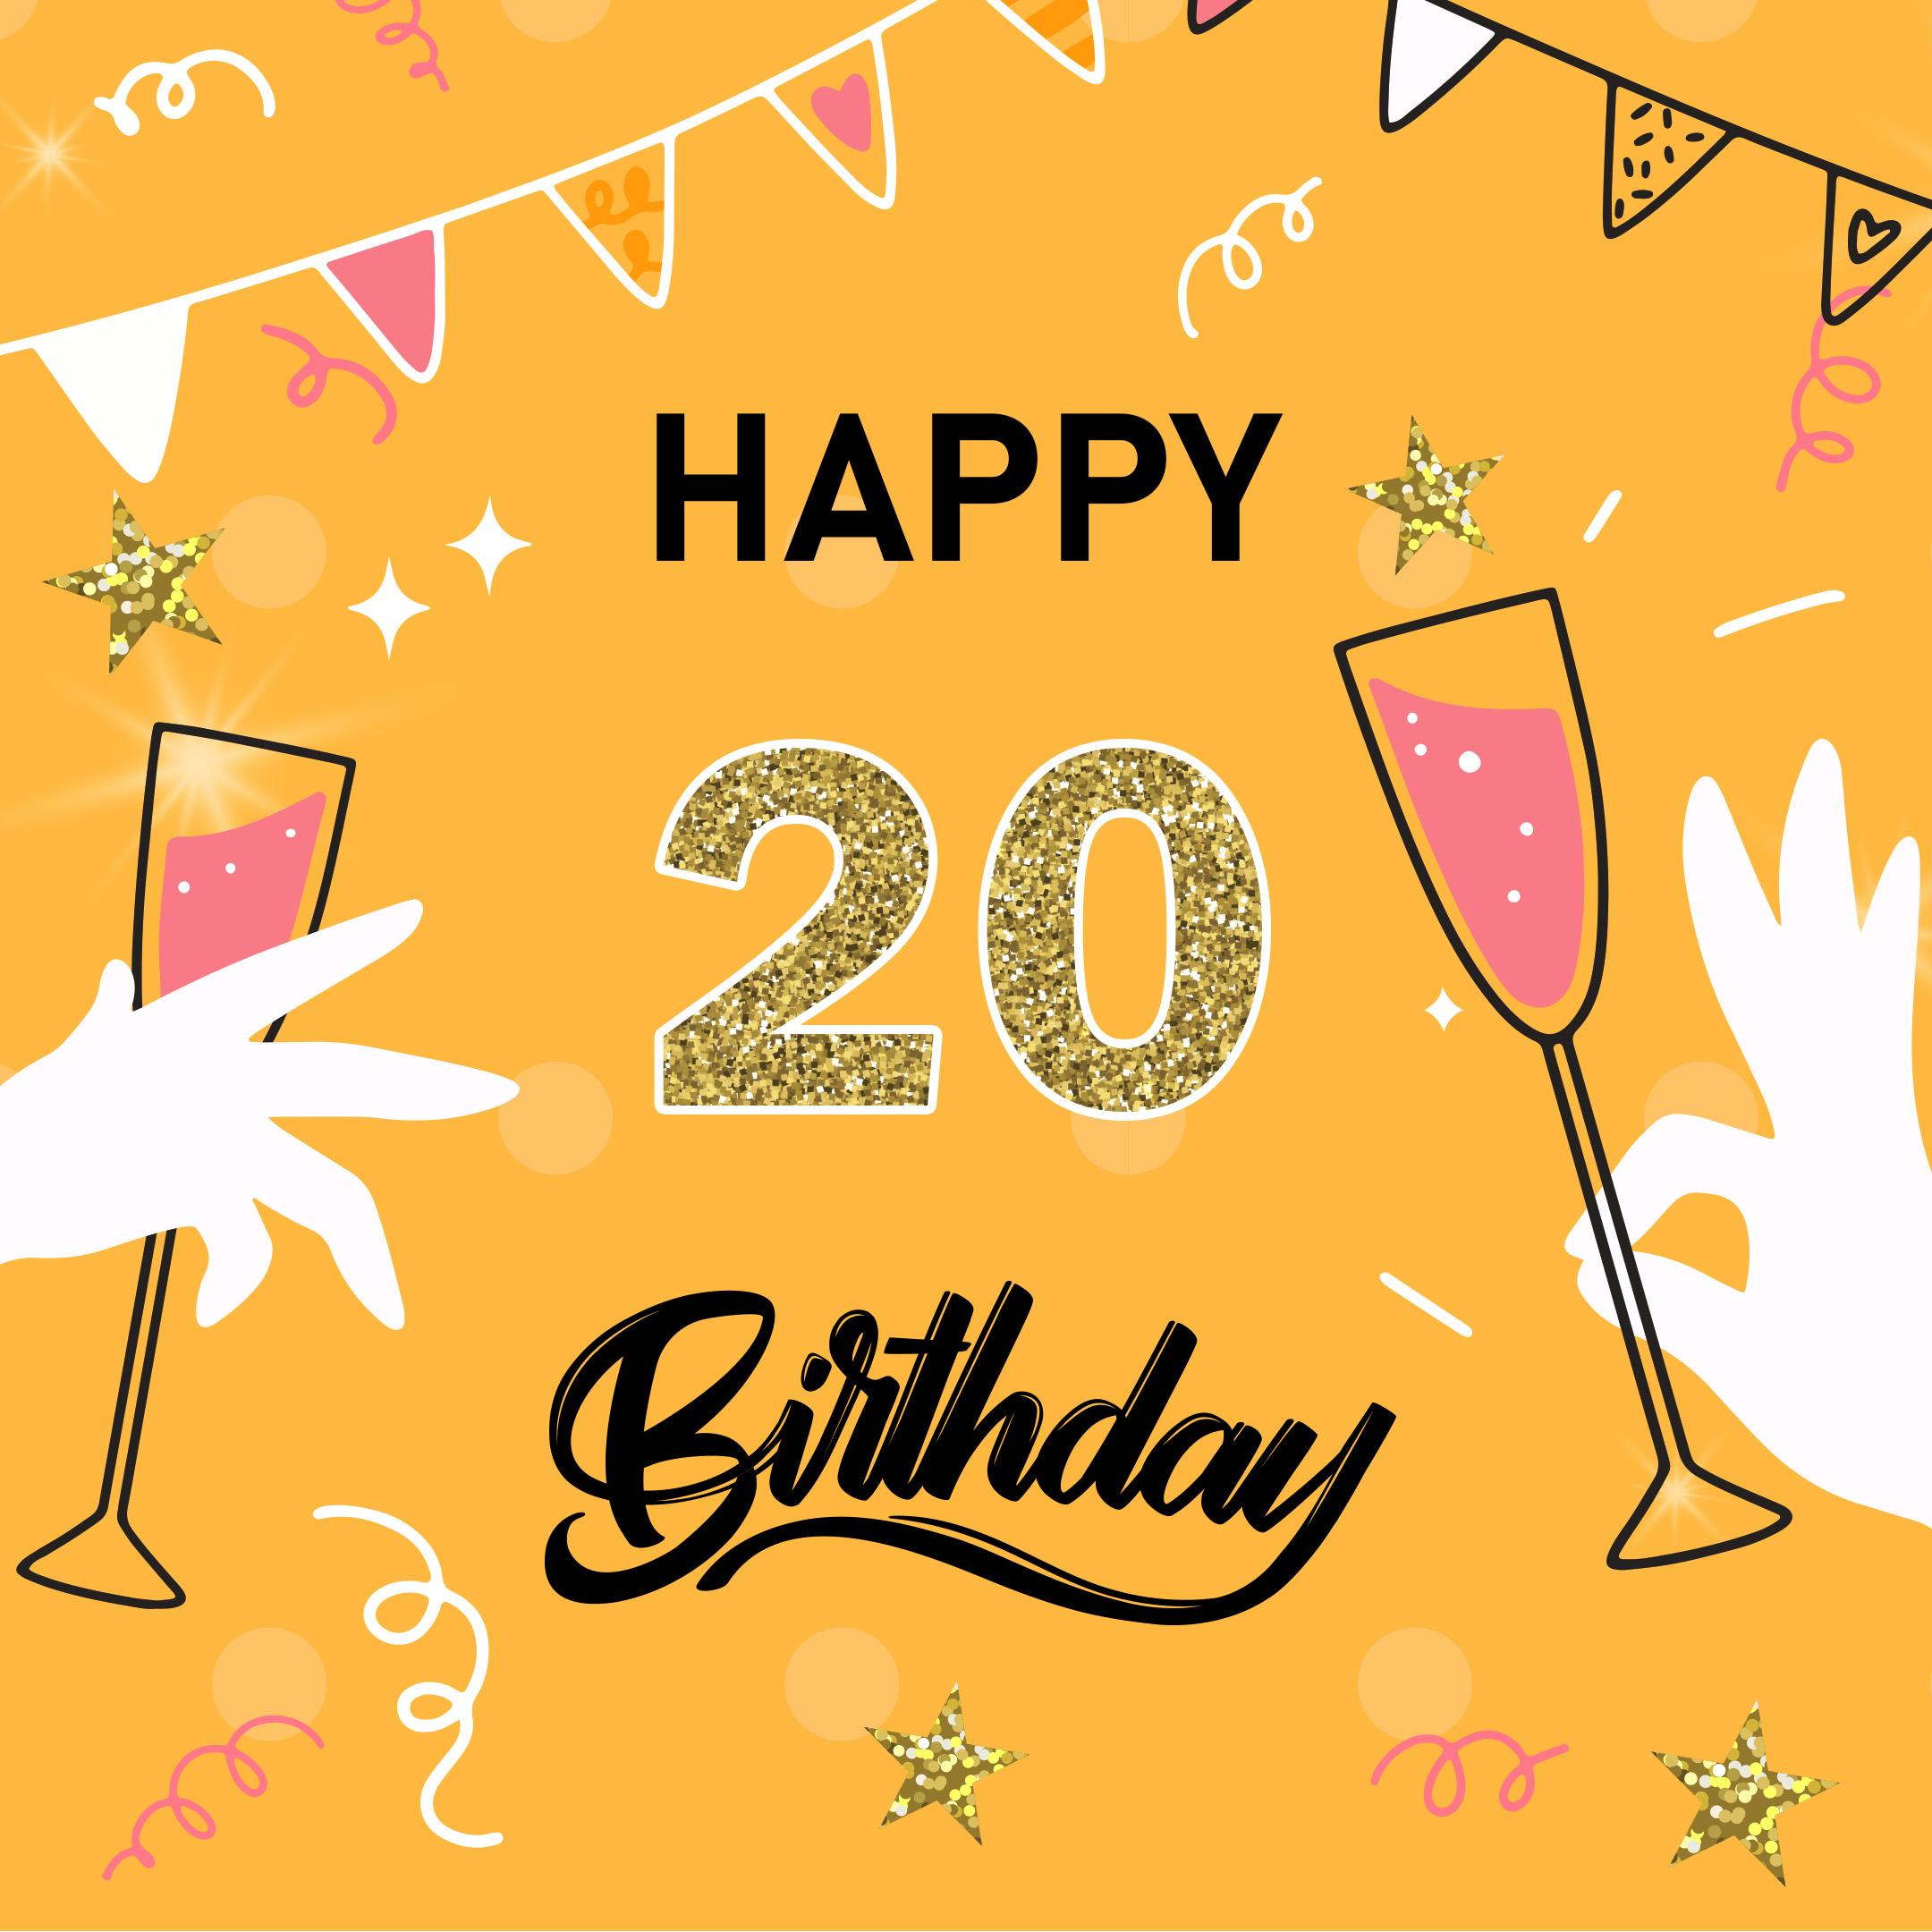 Free 20th Years Happy Birthday Image With Wineglass - birthdayimg.com